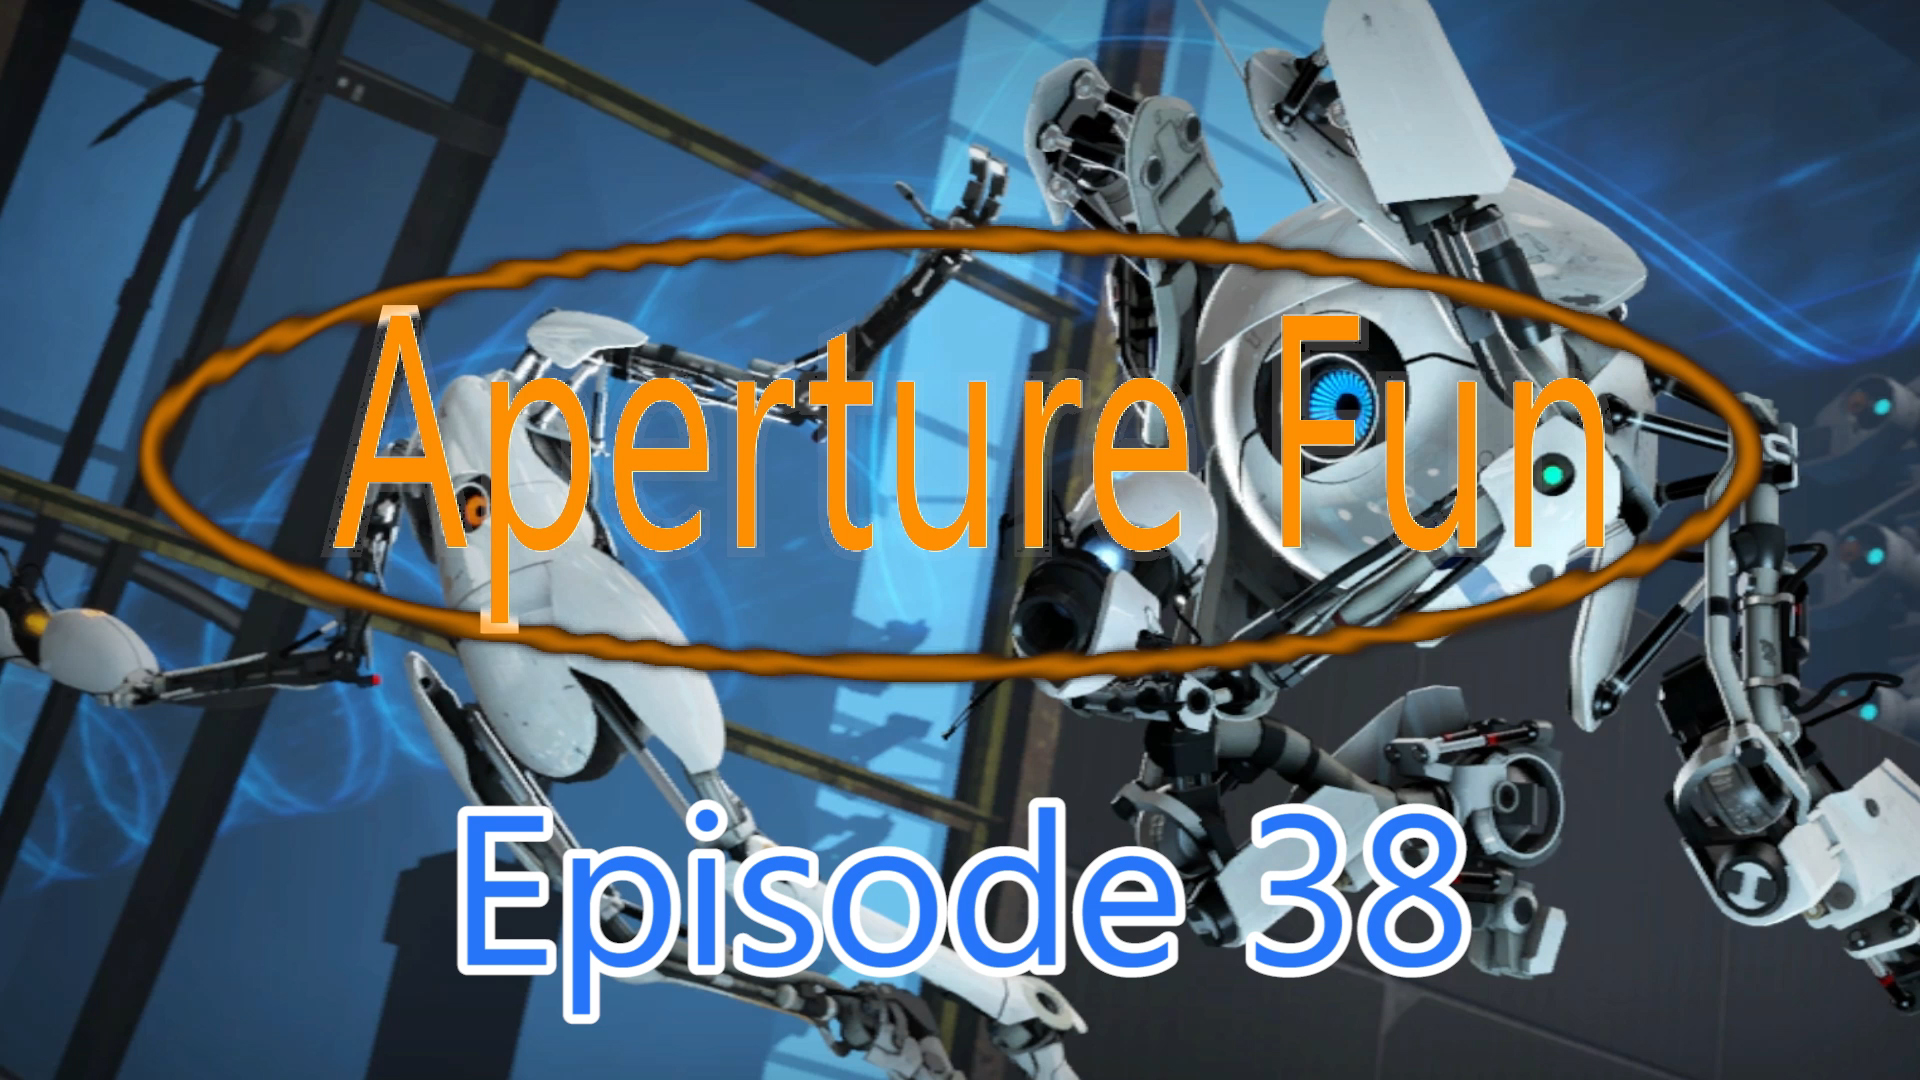 Aperture Fun Episode 29.jpg